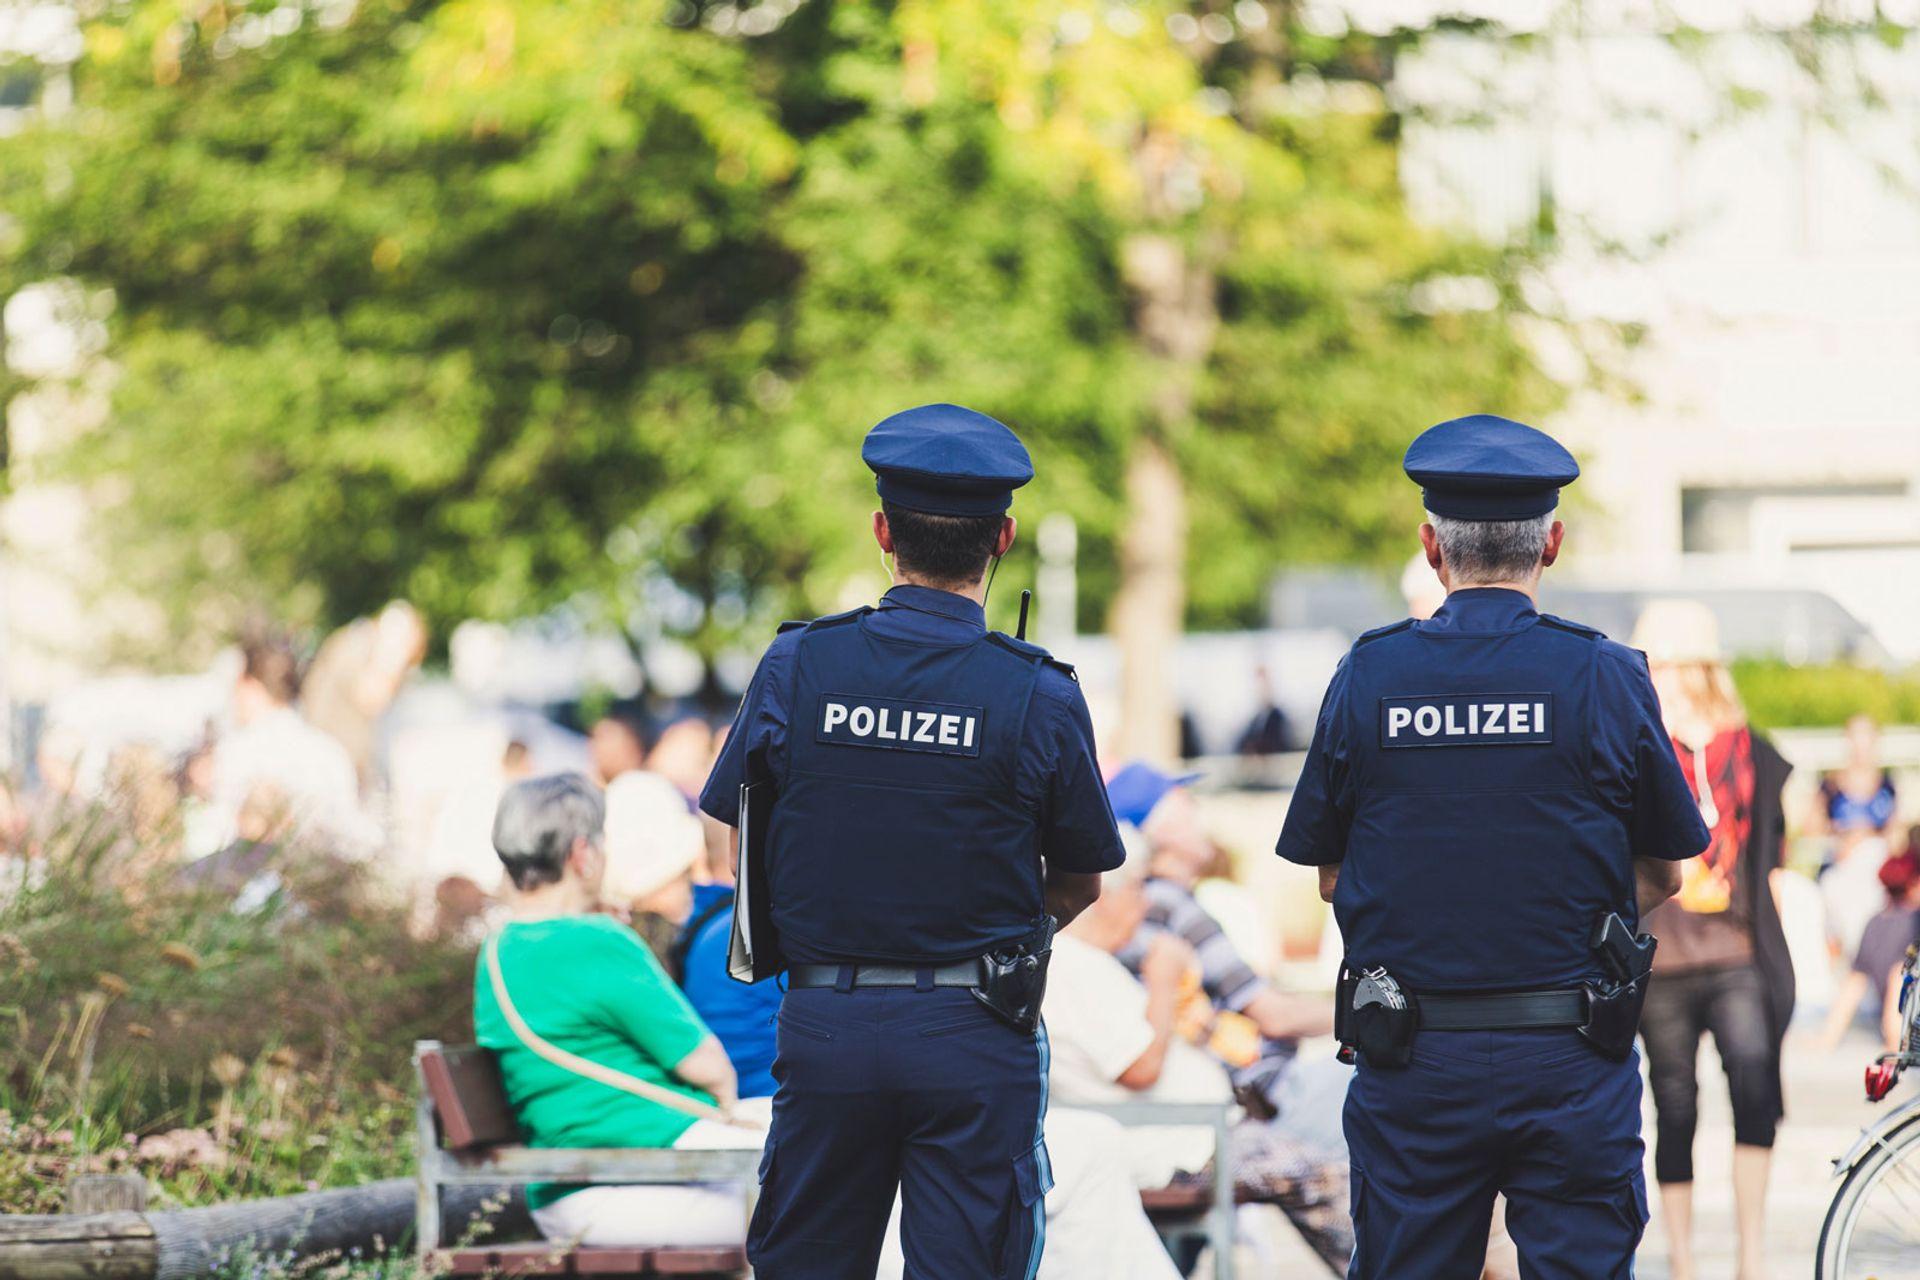 An unnamed Berlin dealer has been arrested by German police © Photo: Markus Spiske